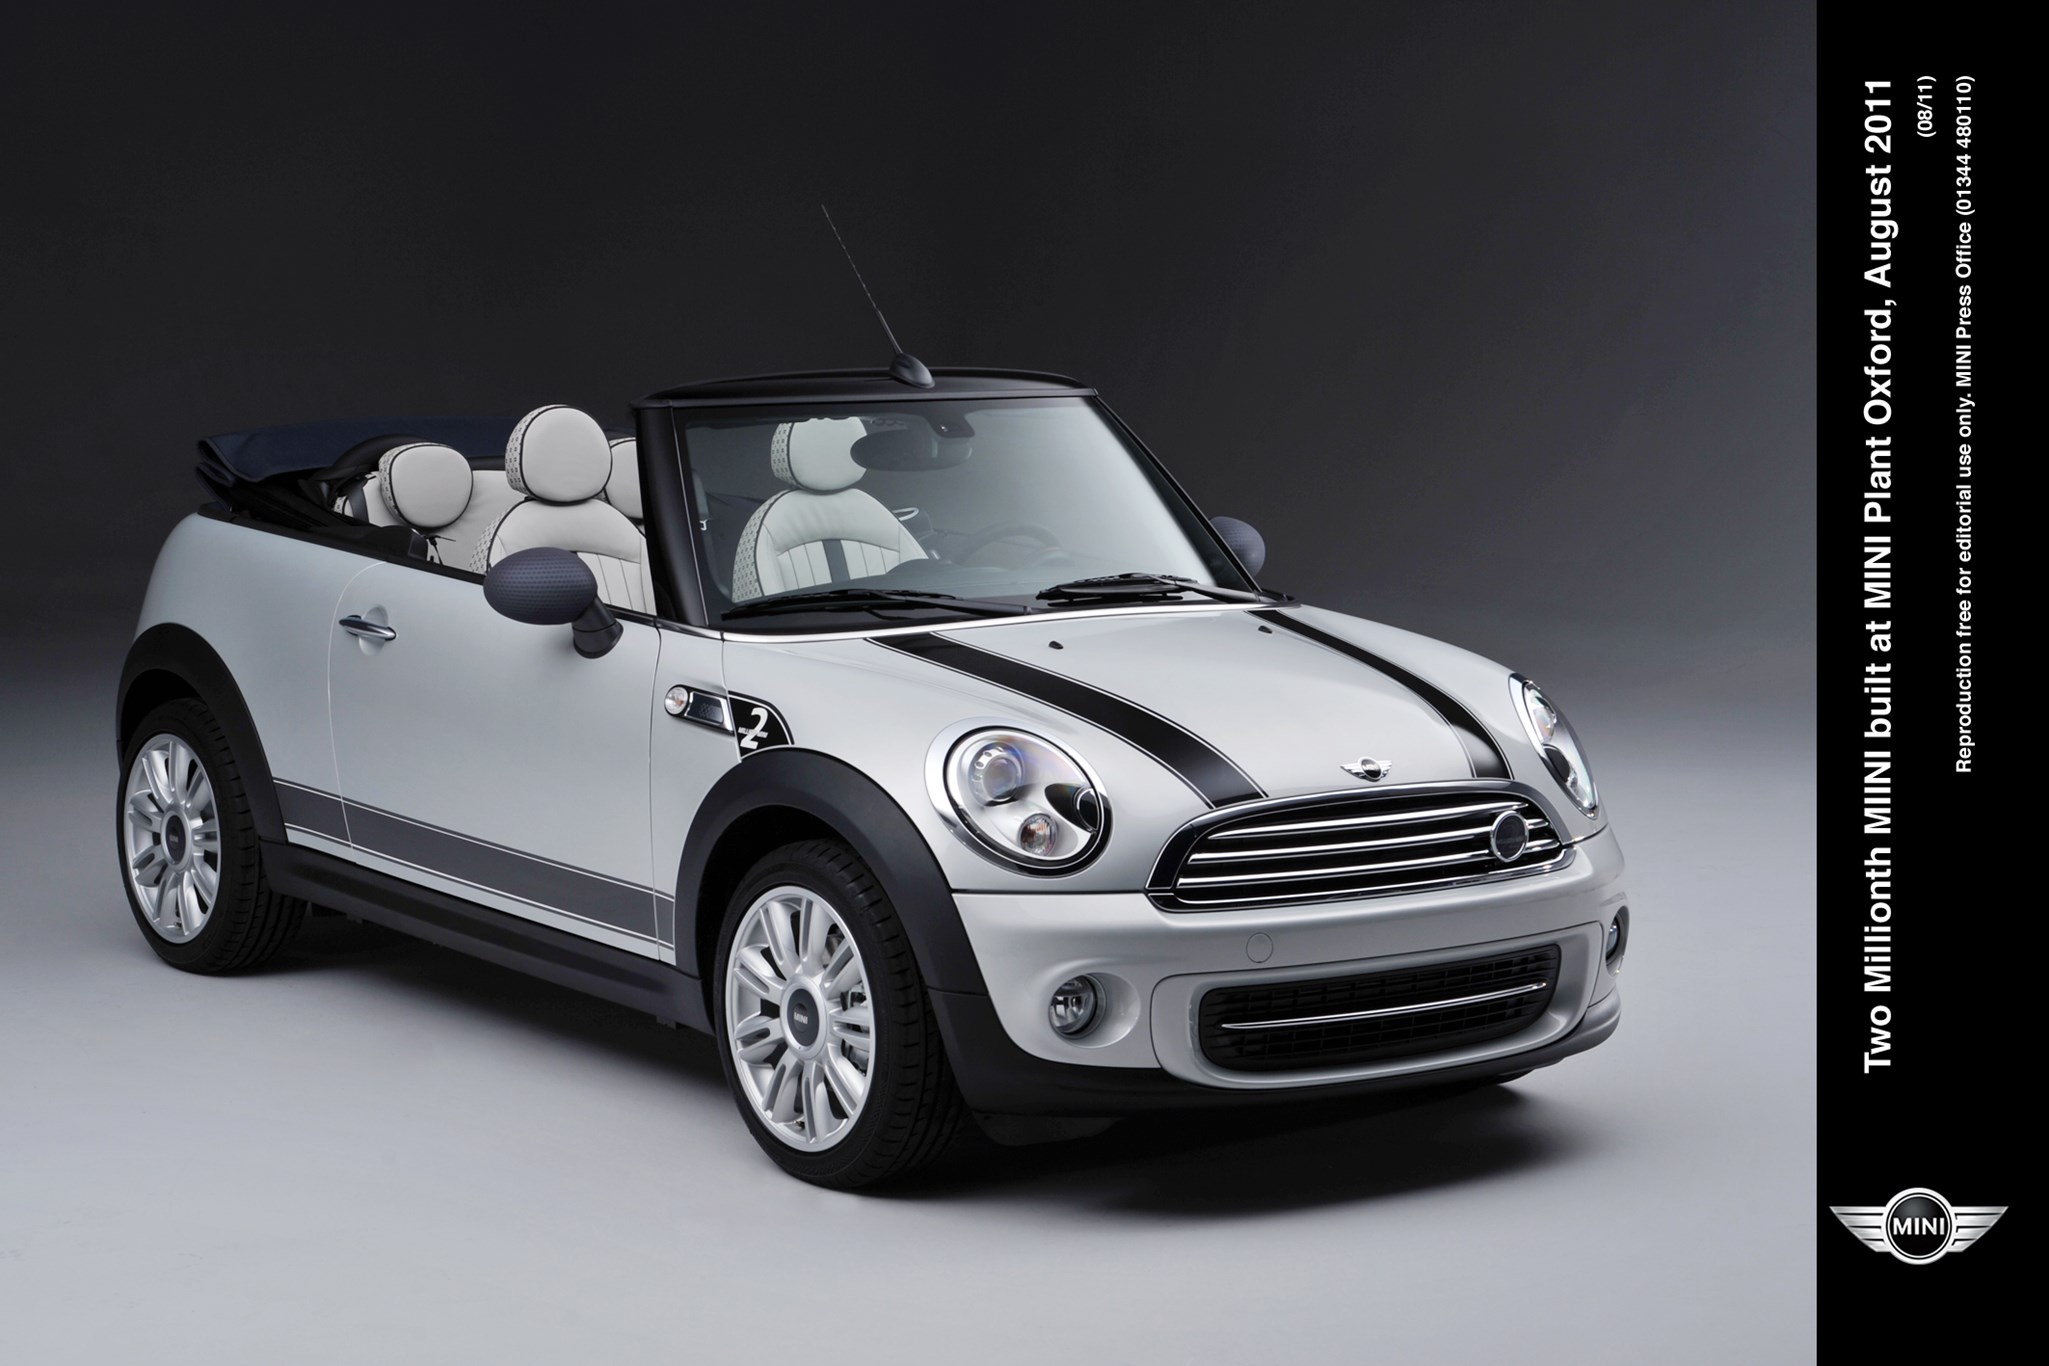 Mini Convertible Car Magazine